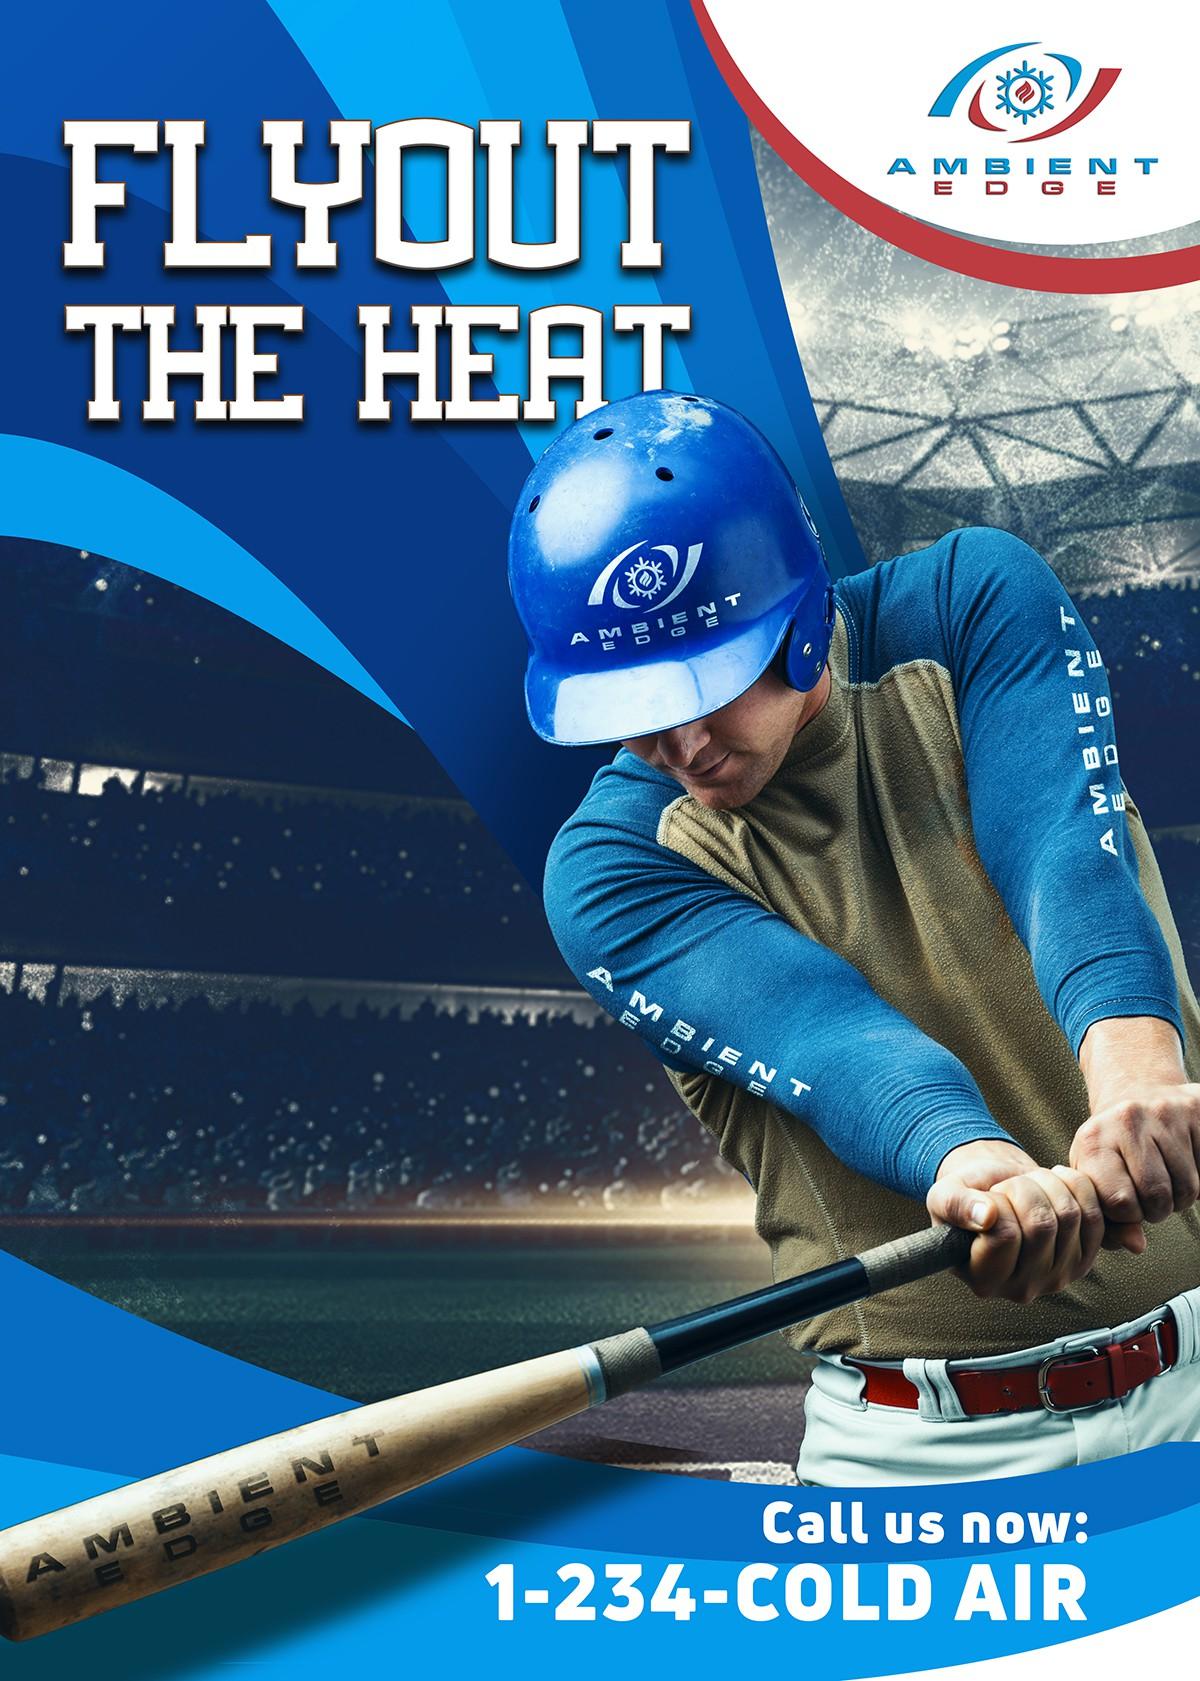 Signage for HVAC Sponsorship in AAA Baseball Stadium